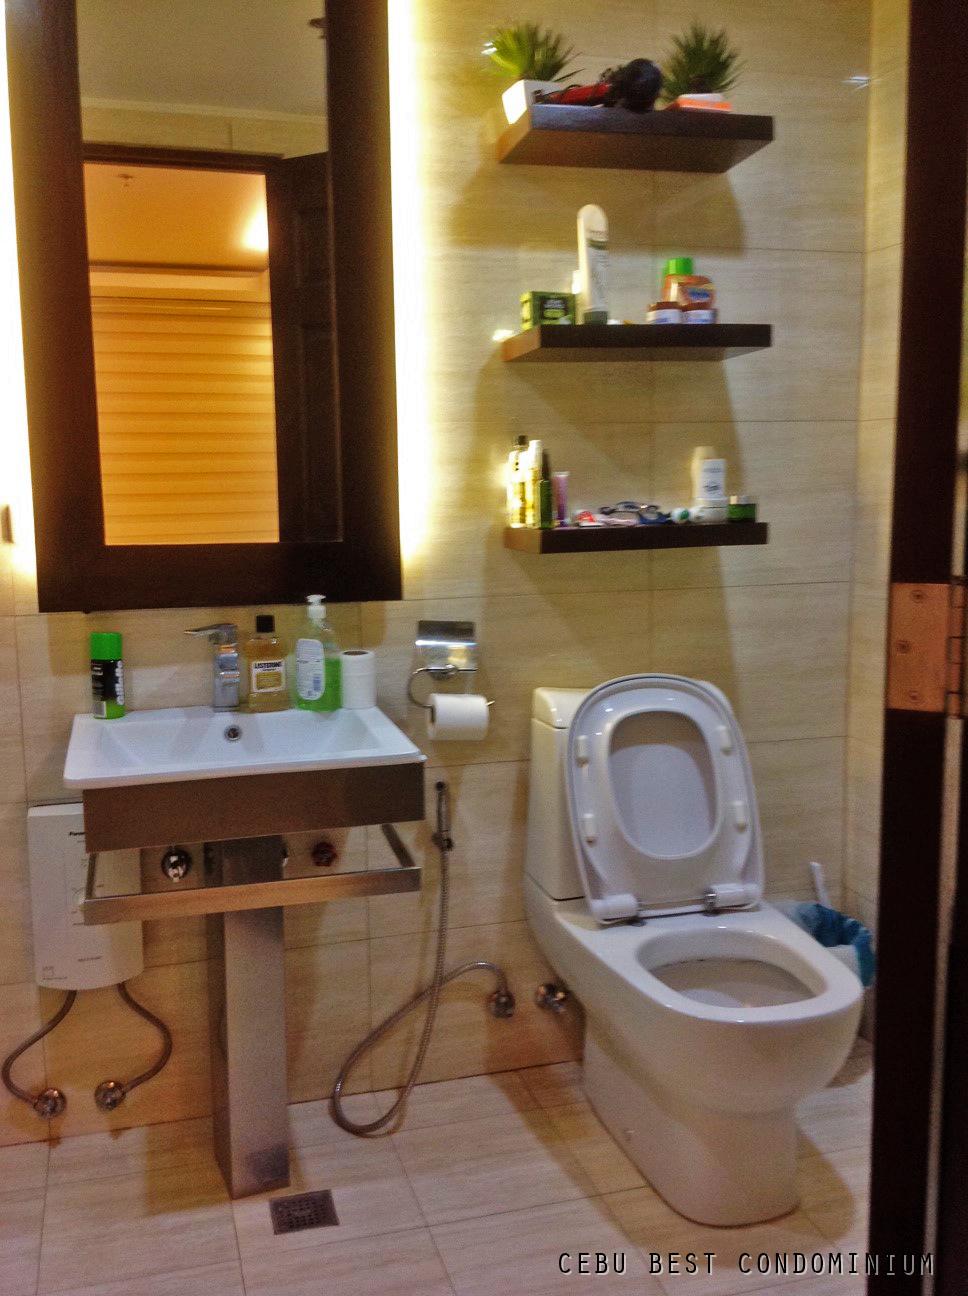 Avalon 2 Bedroom for sale comfort